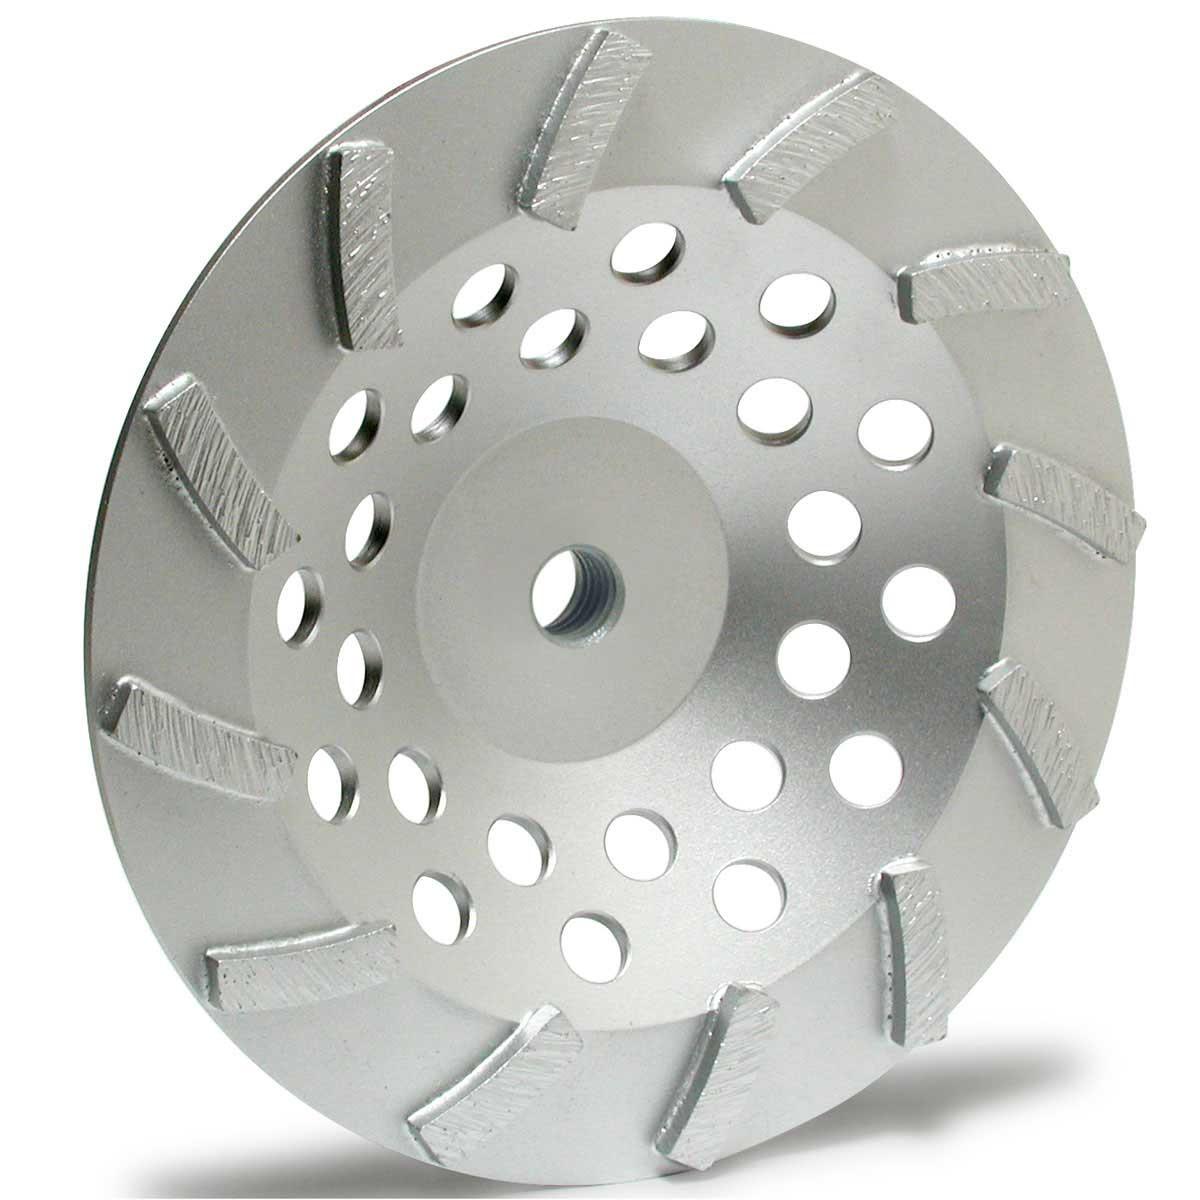 MK-504 Single Row Diamond Cup Wheel